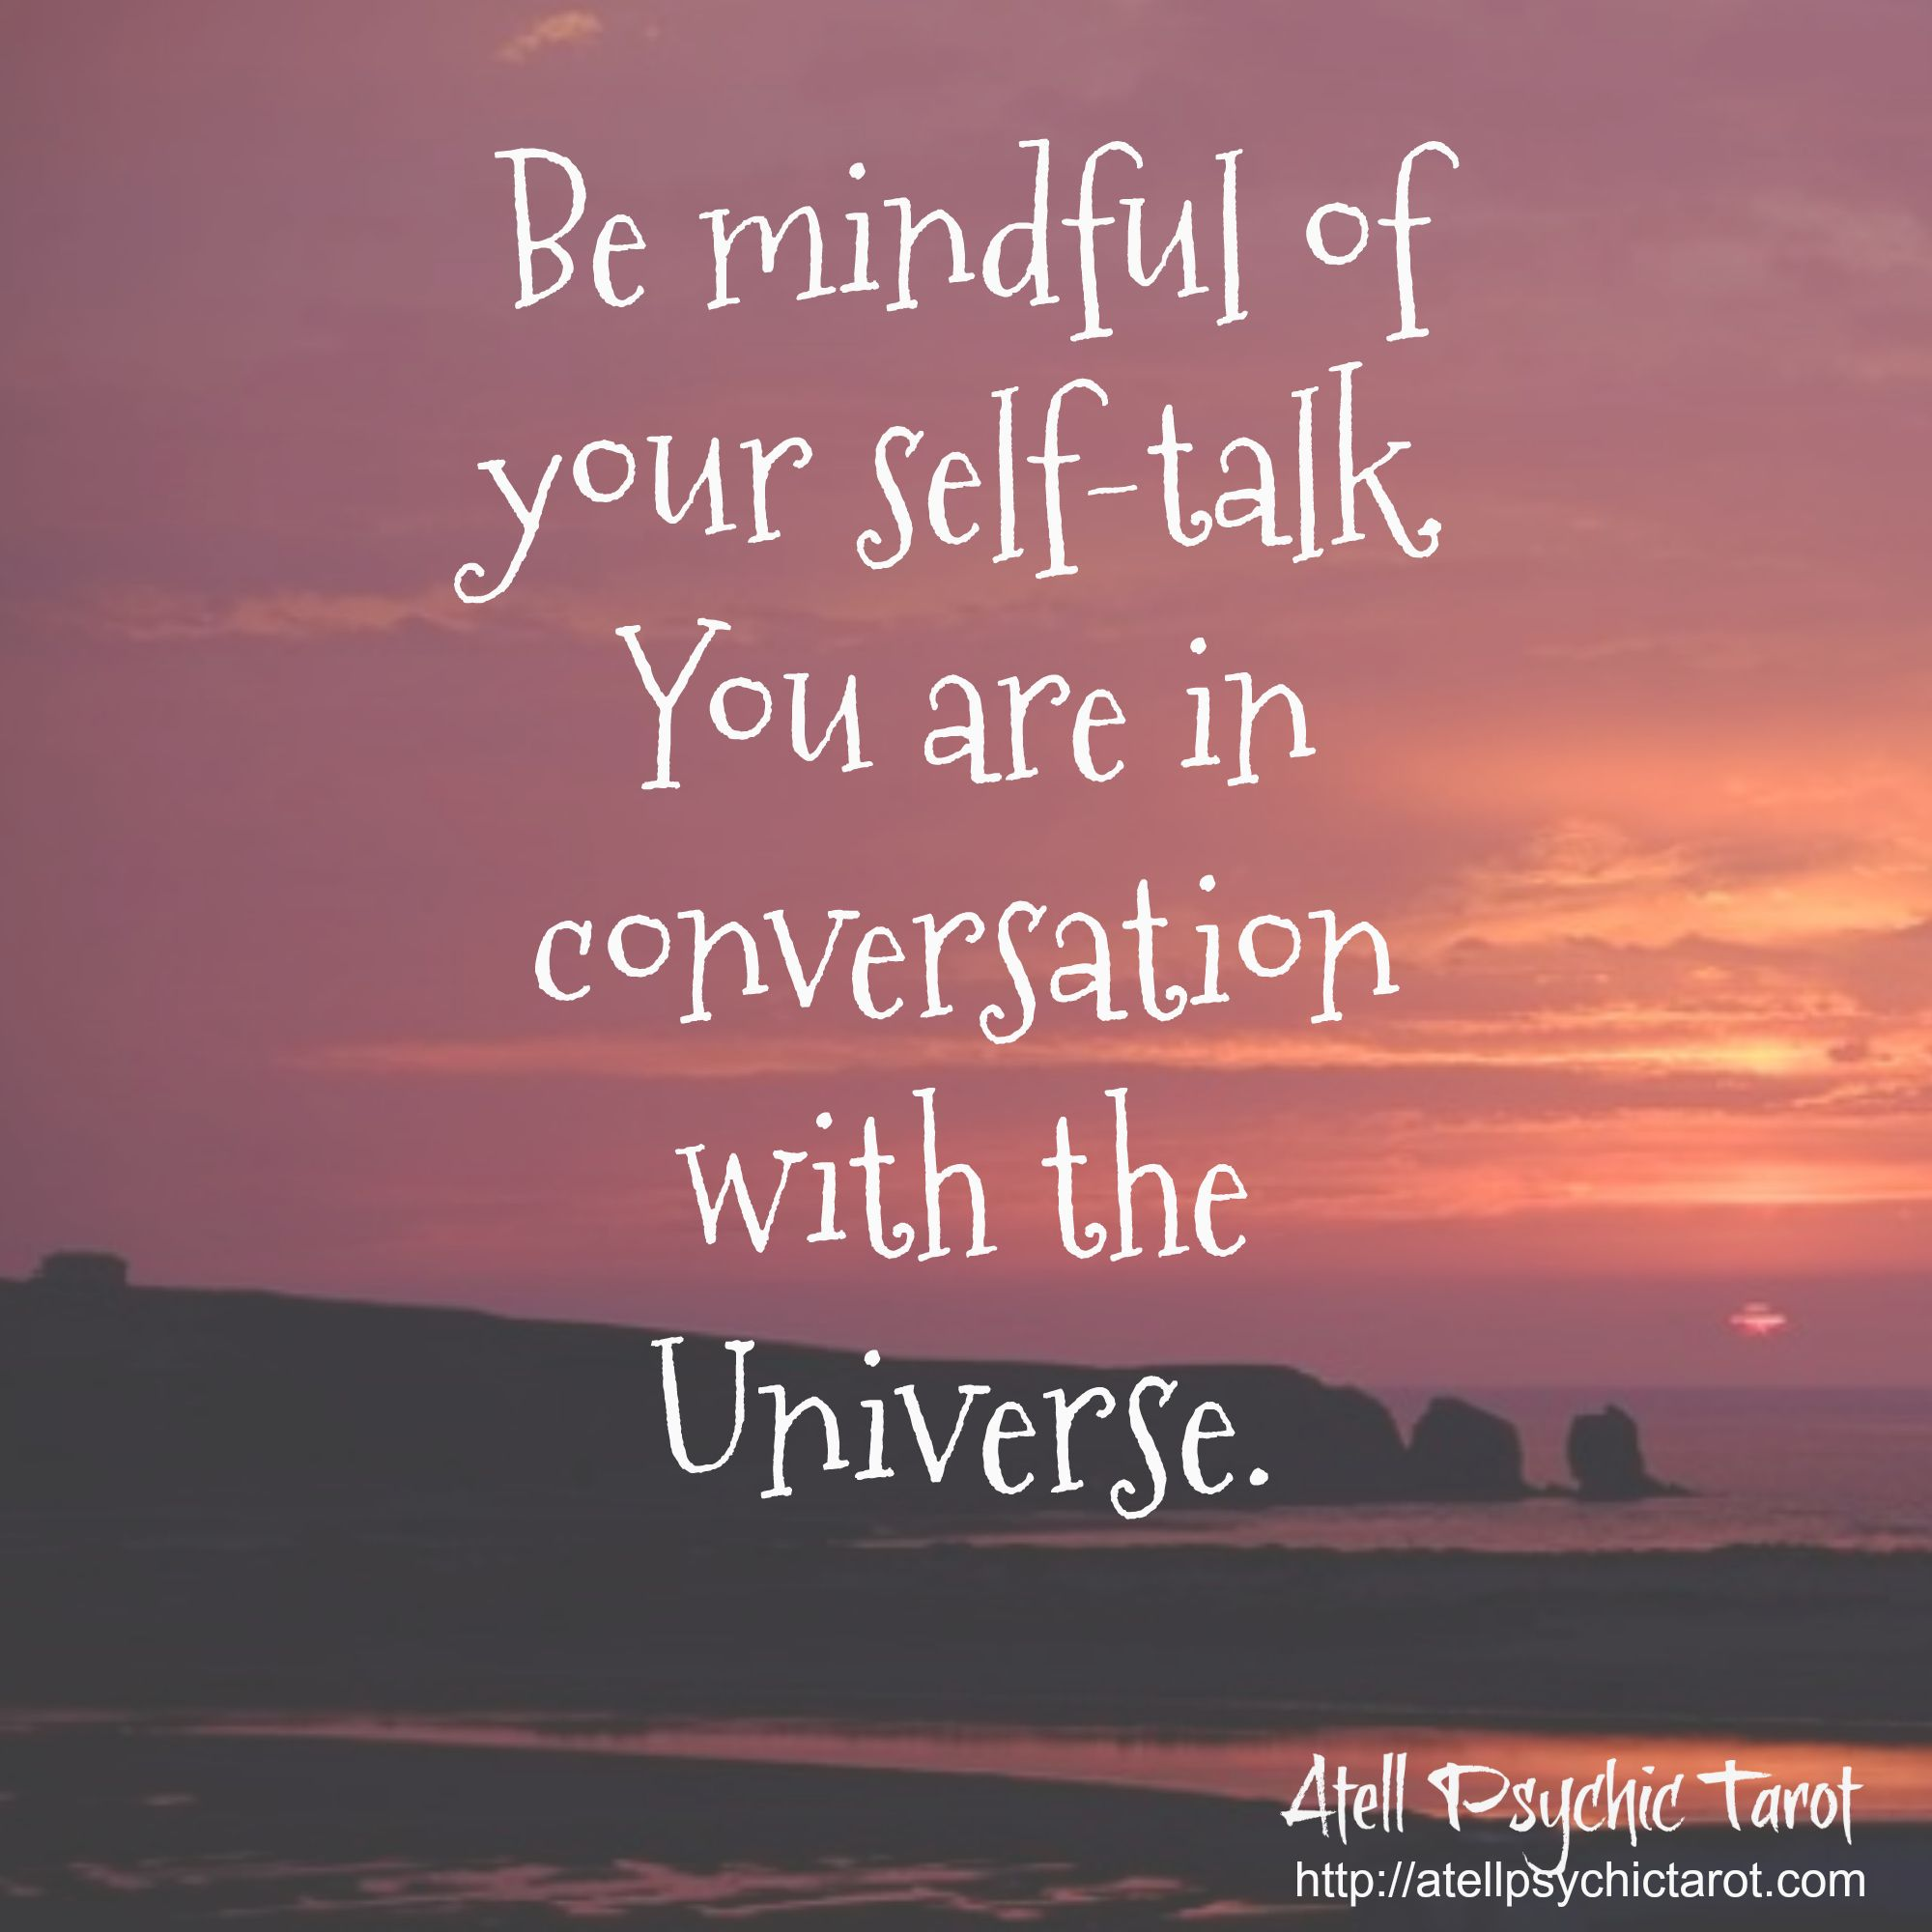 motivational self talk quotes